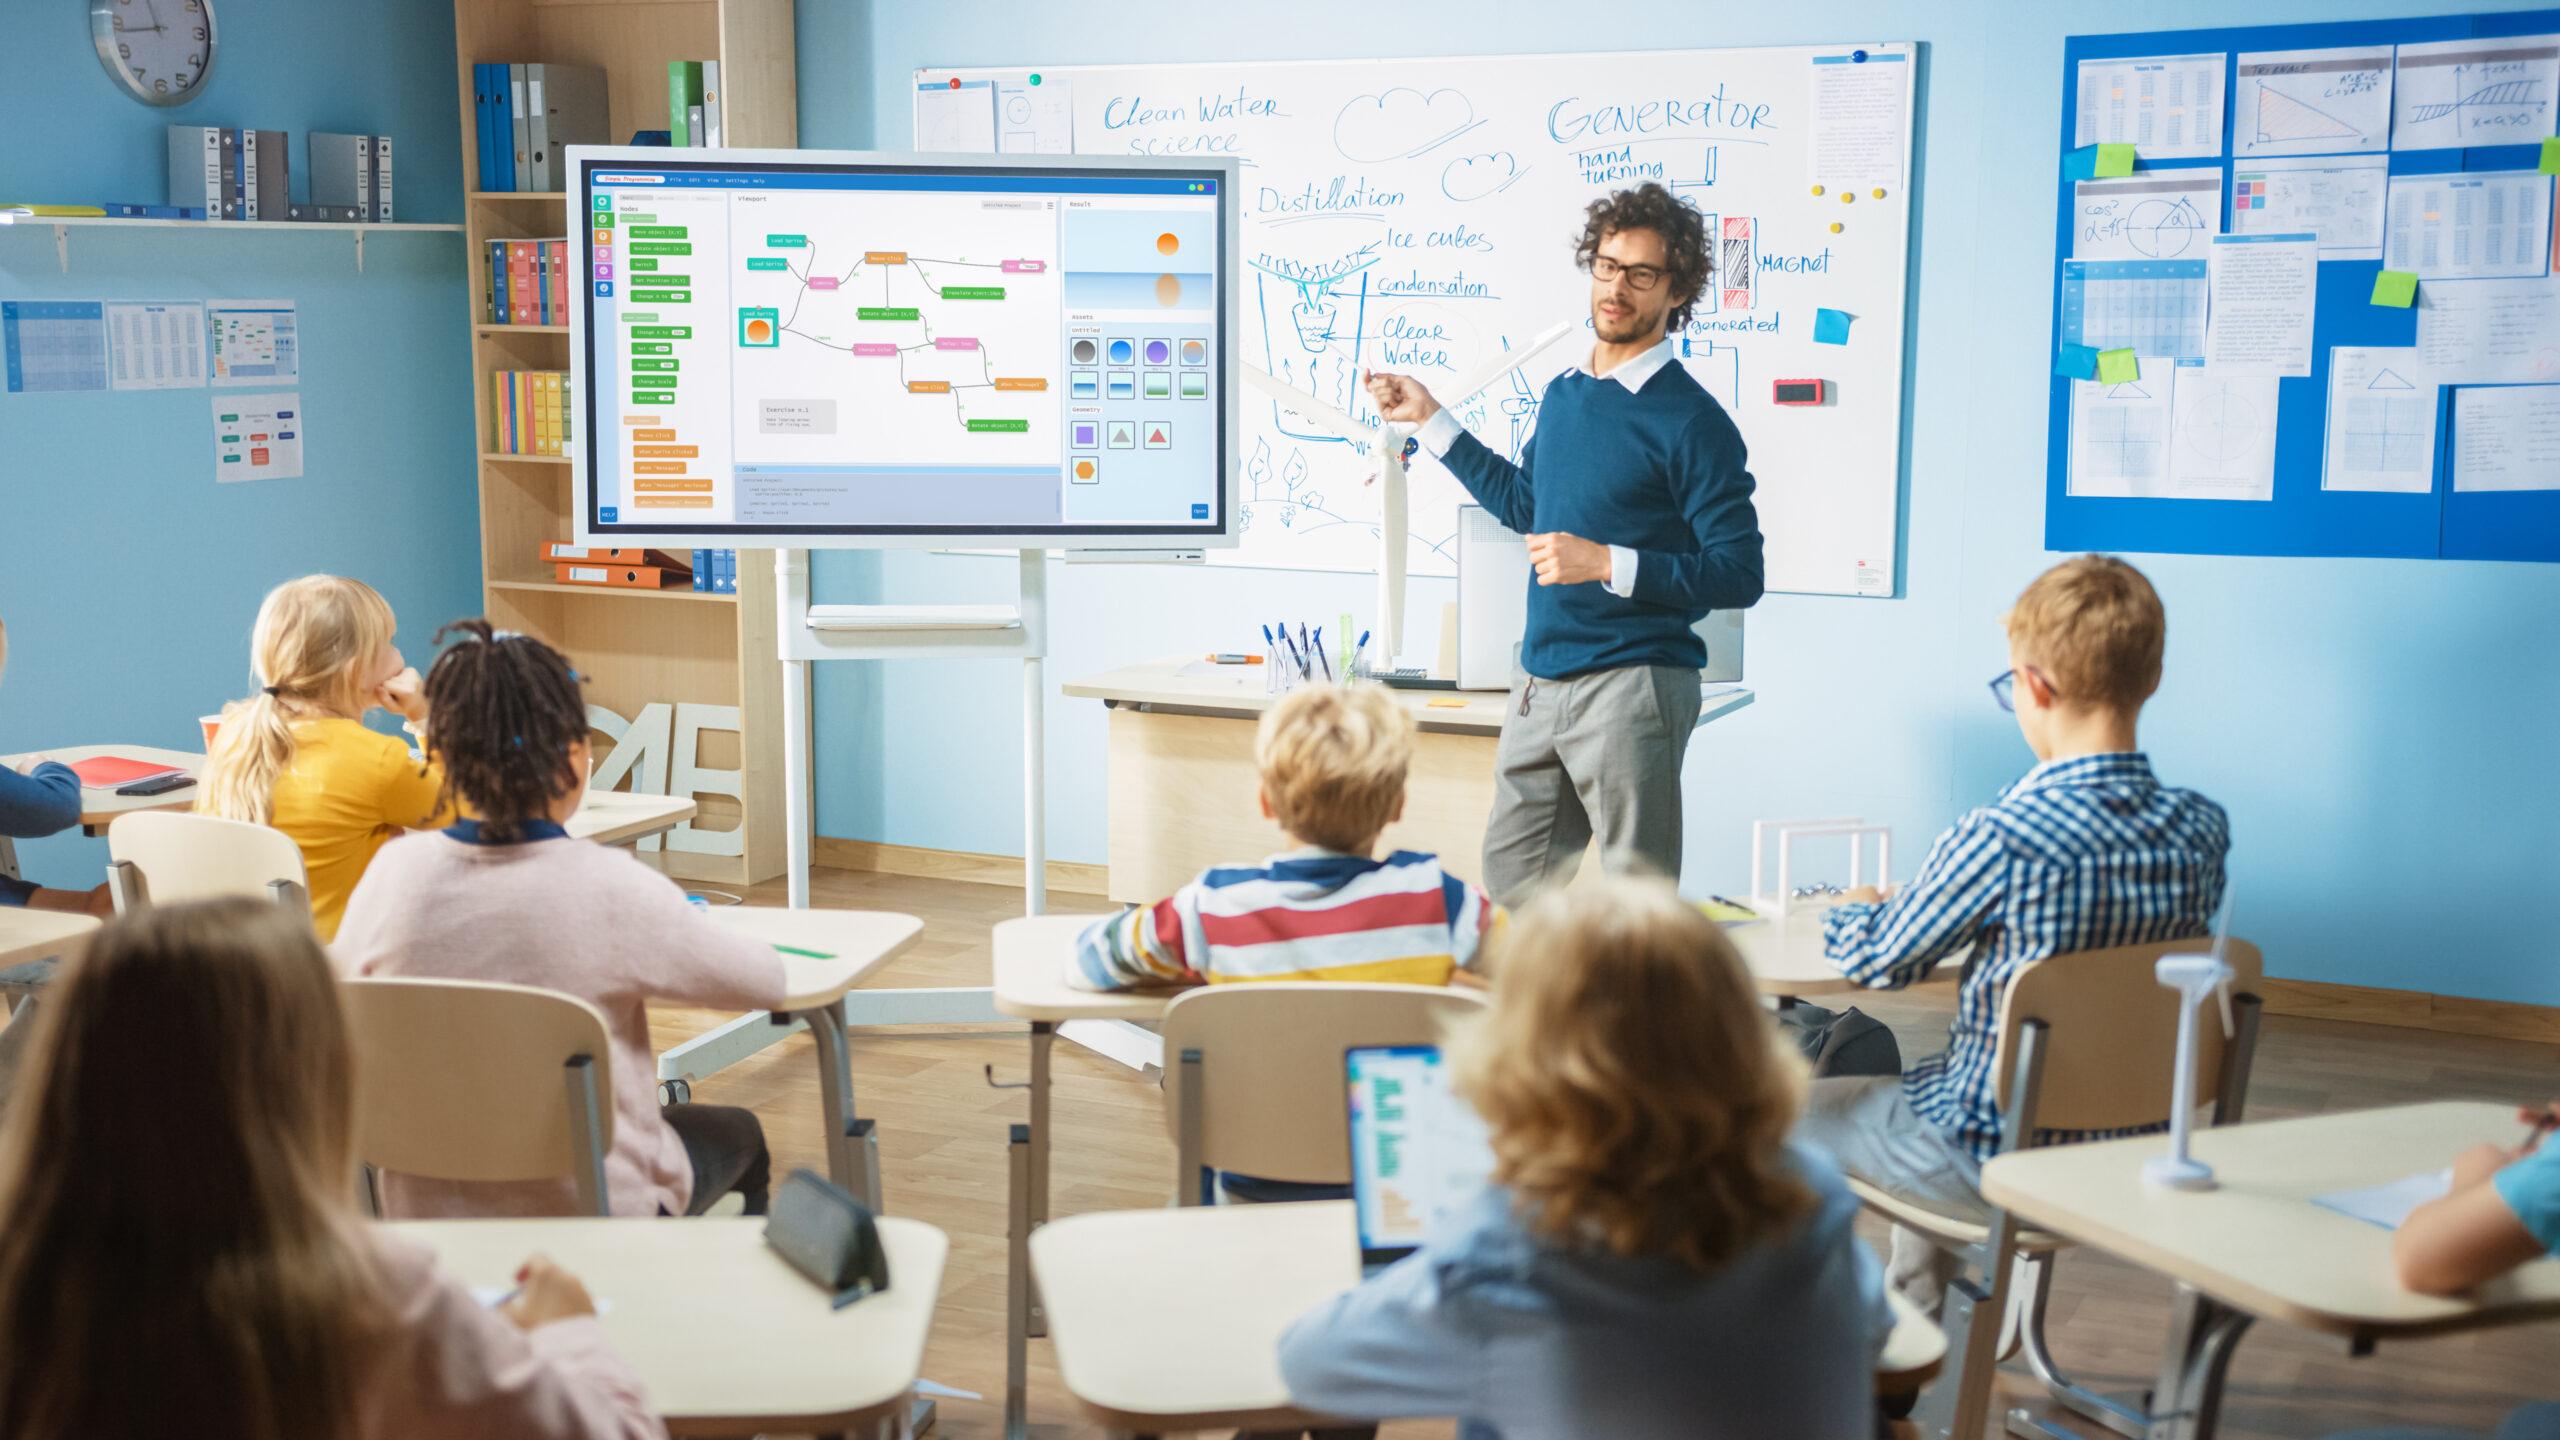 Tecnologie multimediali a scuola